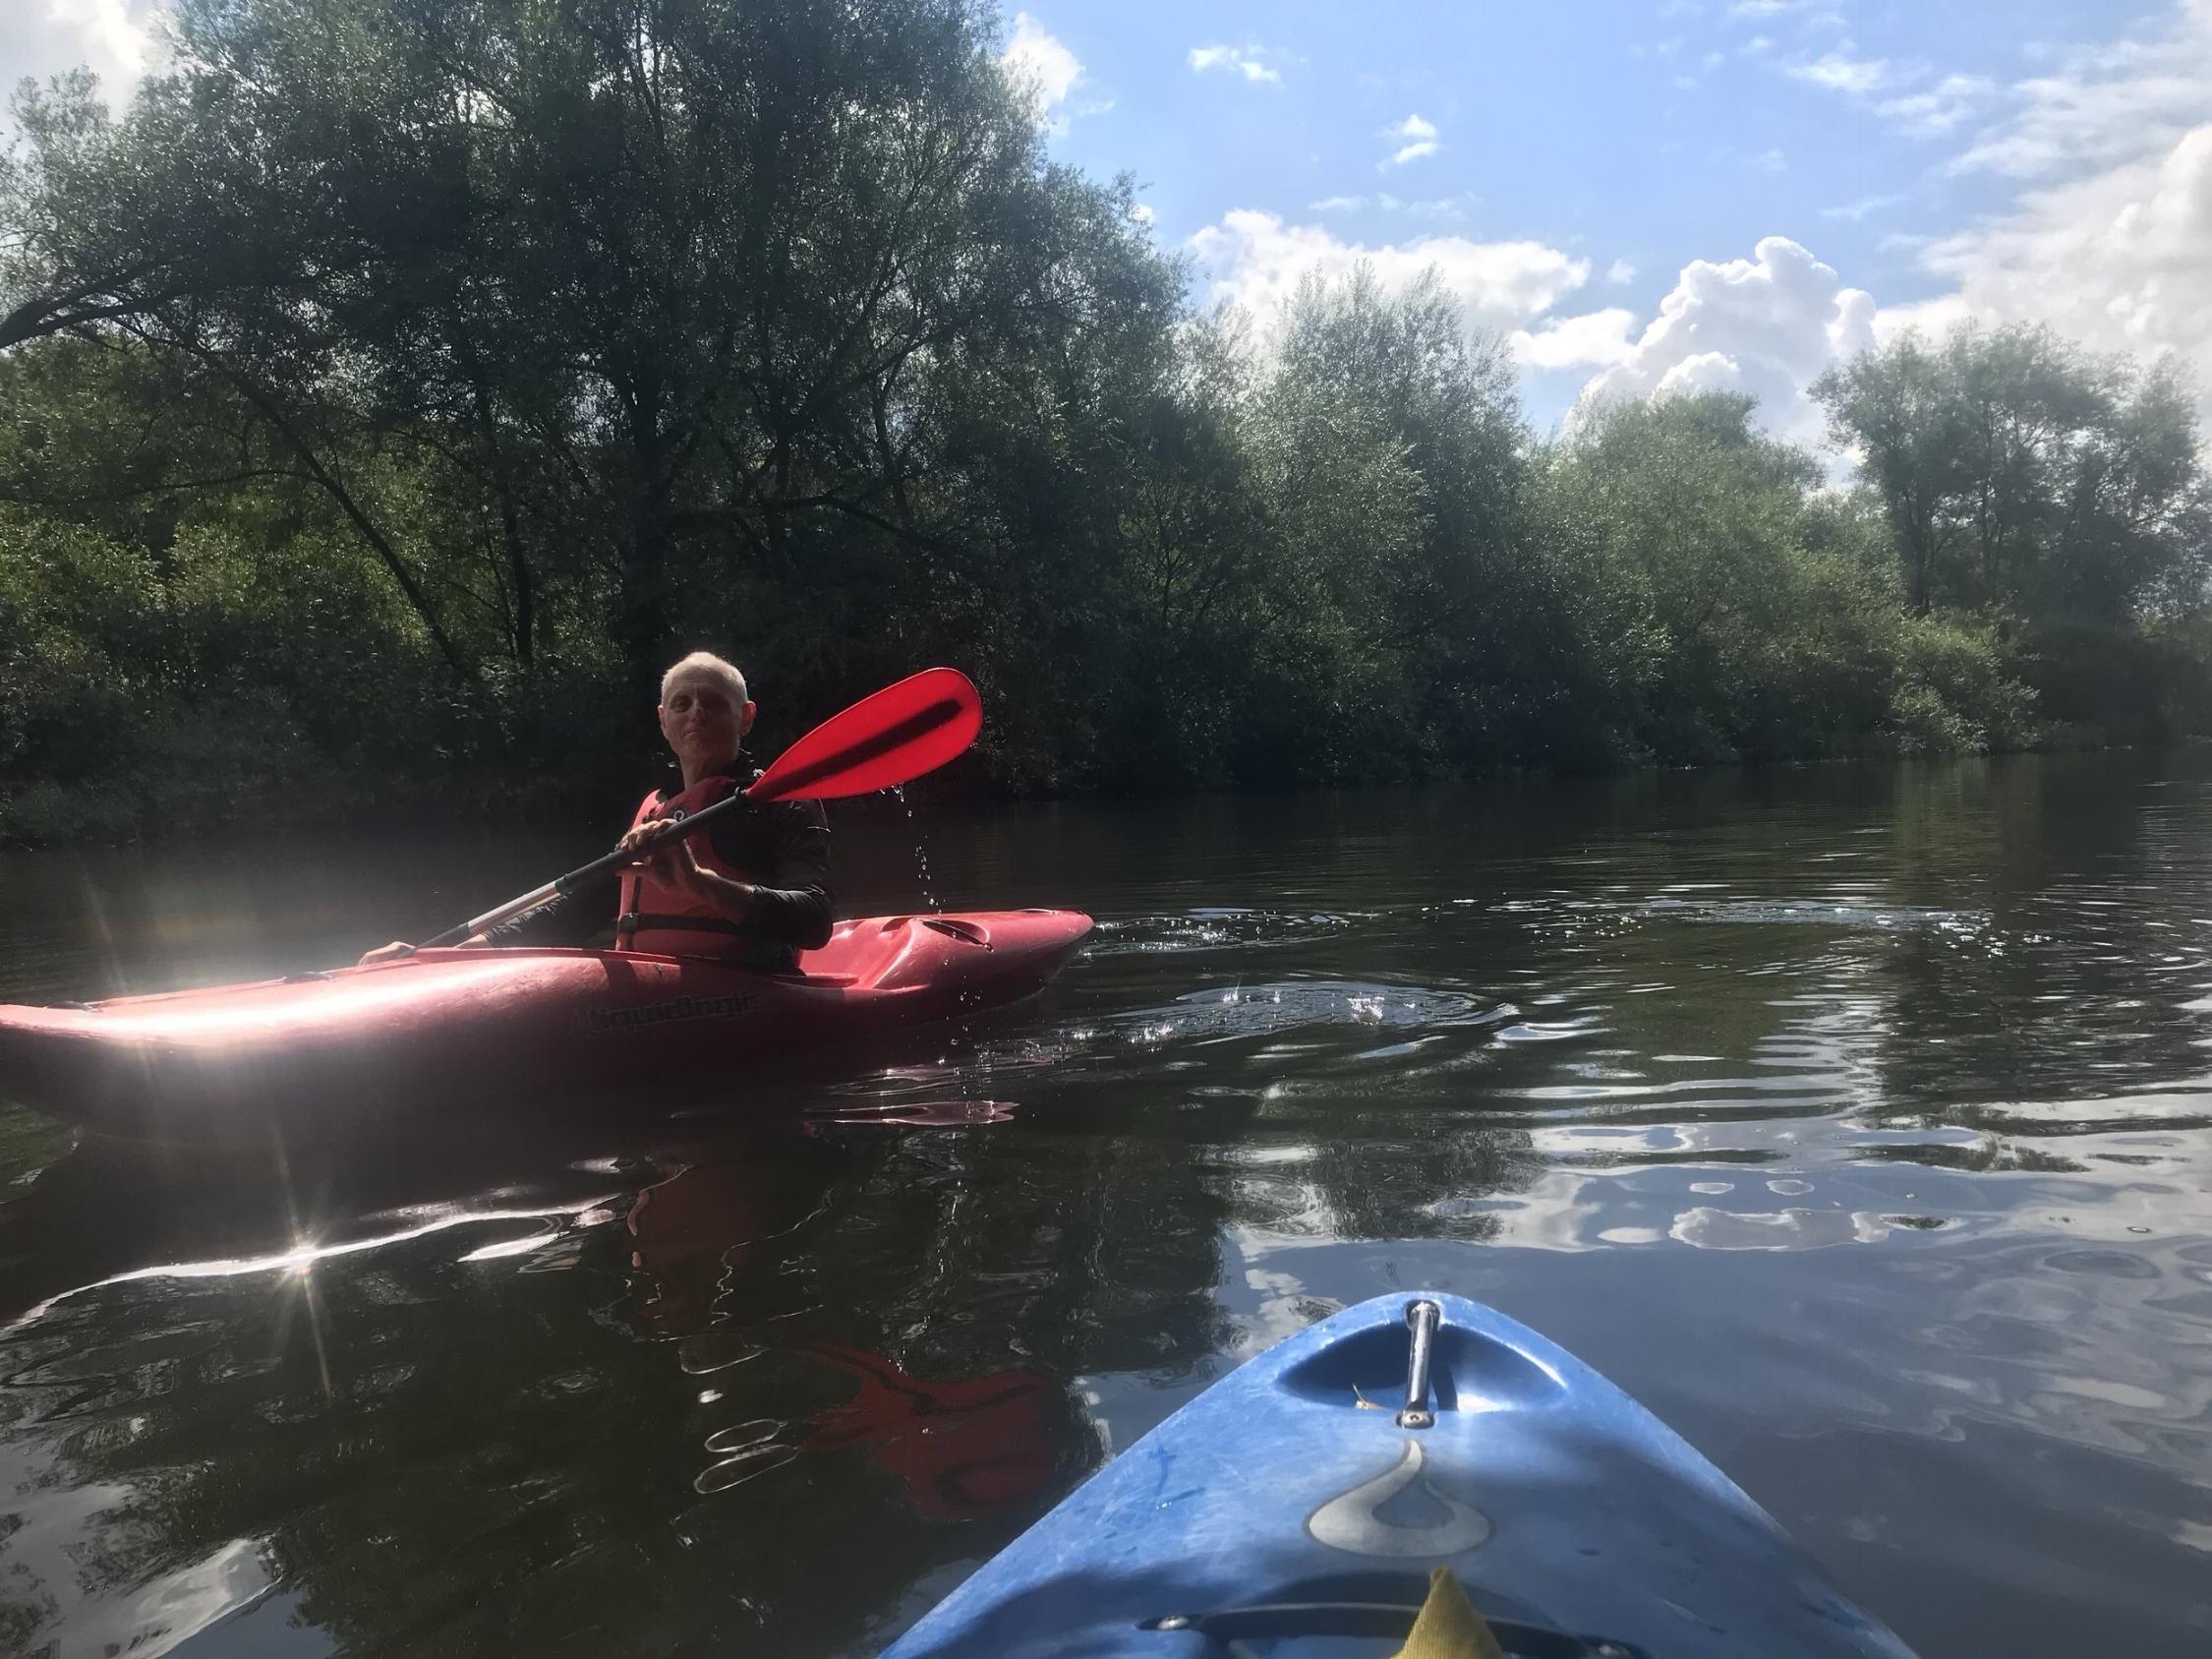 Kayaking on the River Don, Sprotborough